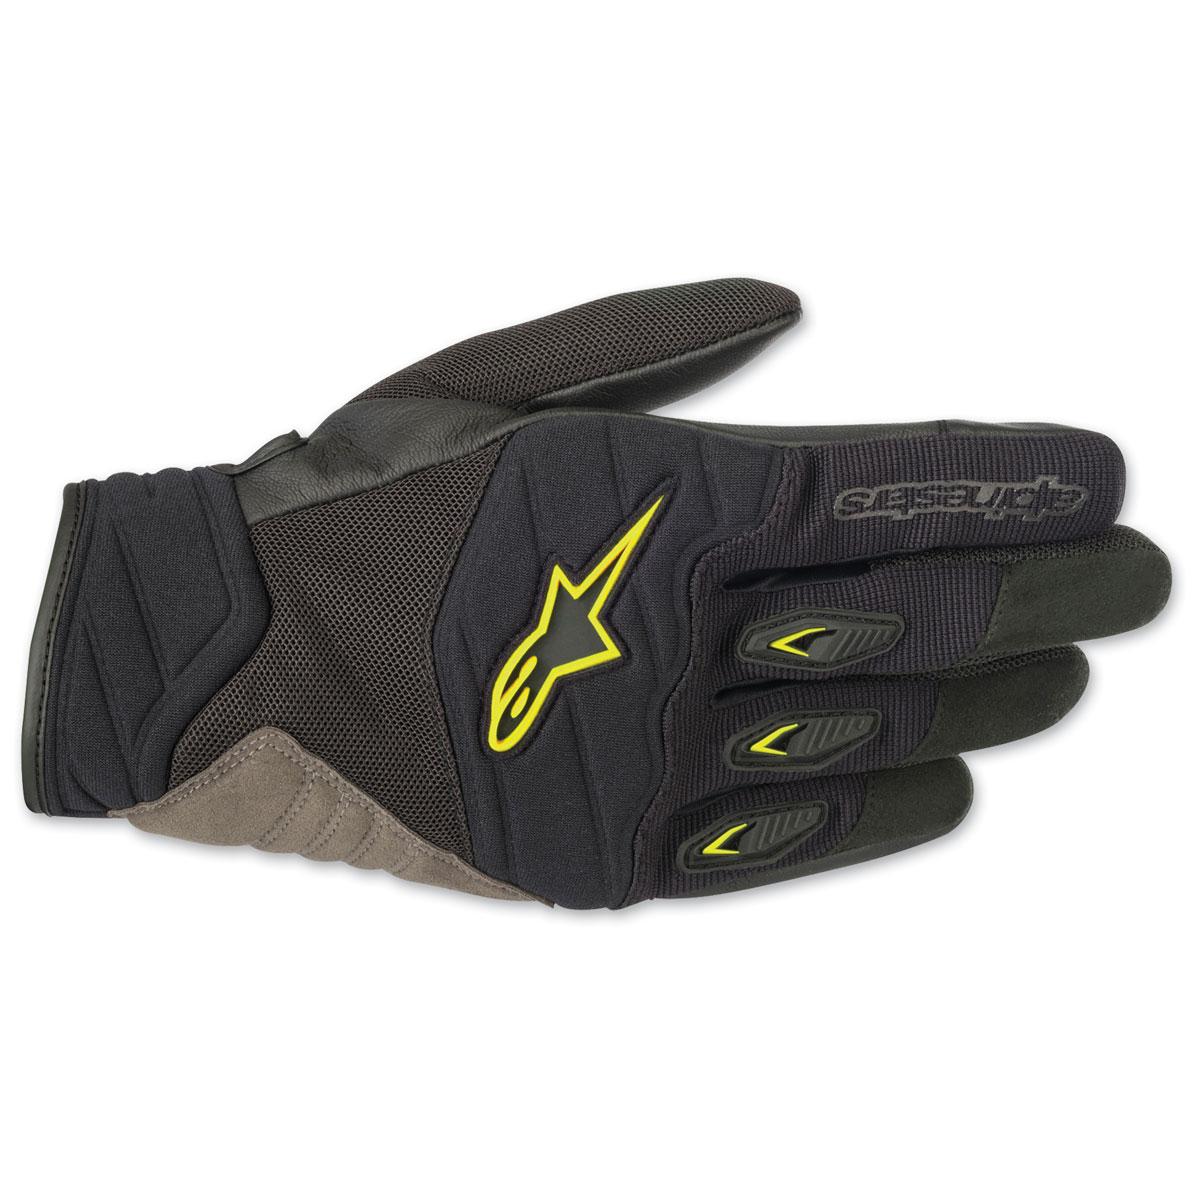 Alpinestars Men's Shore Black/Yellow Gloves